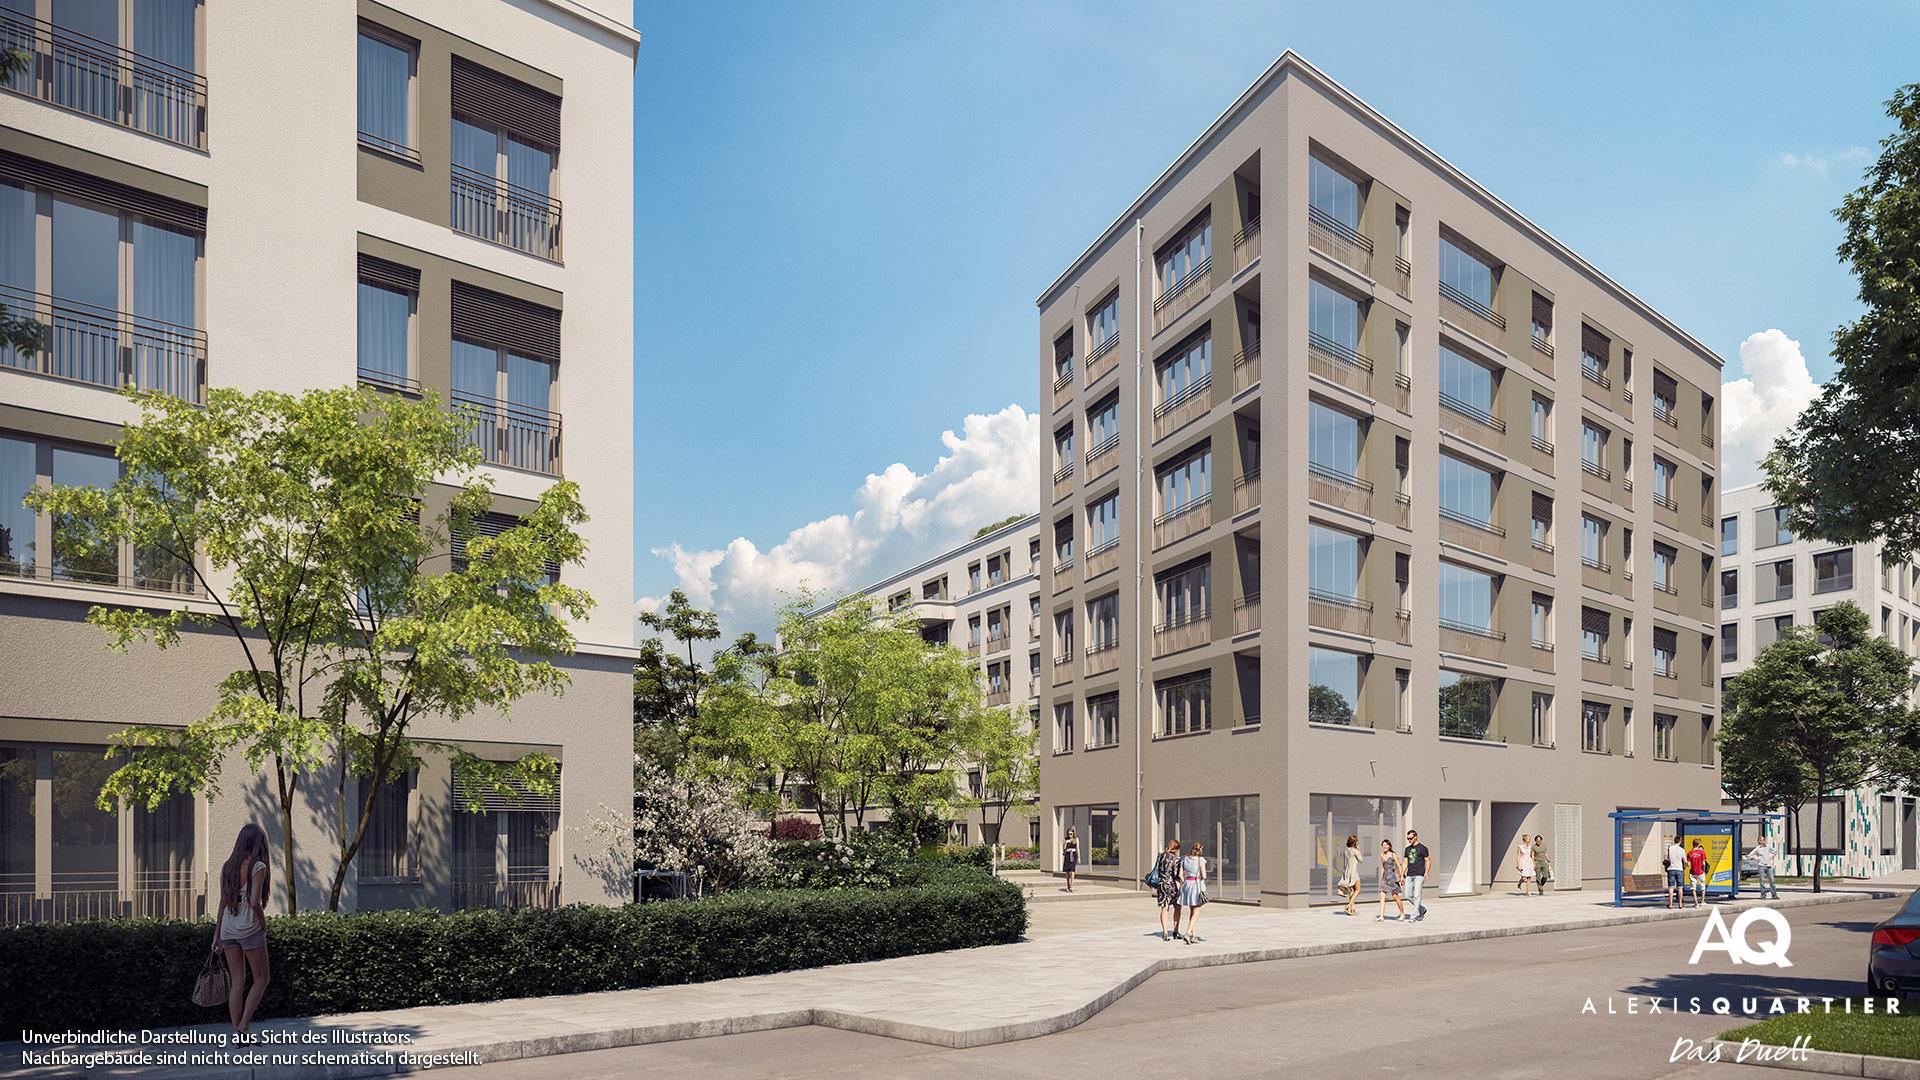 Immobilie Alexisquartier - Das Duett - Illustration 4